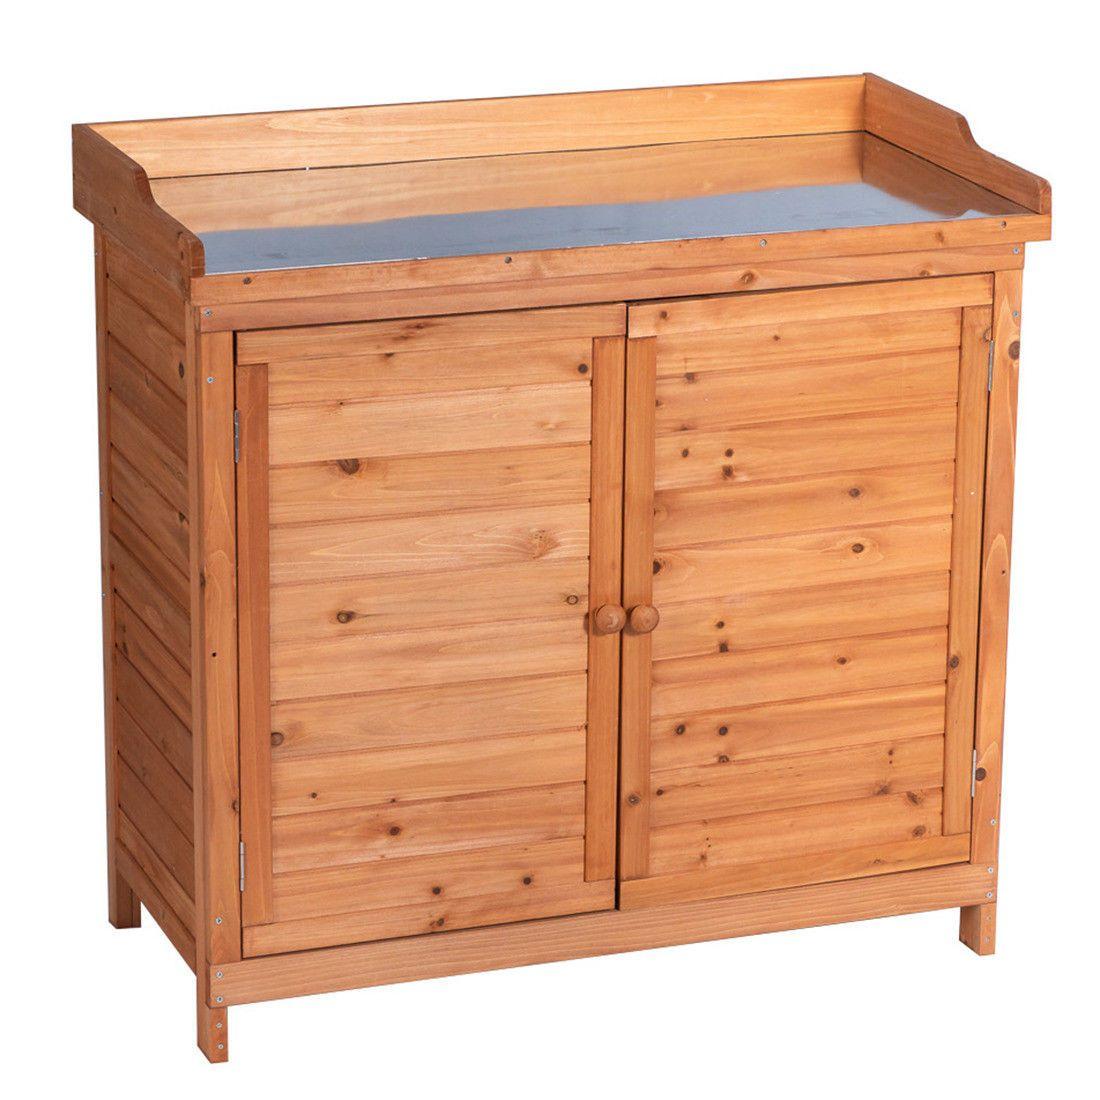 Outdoor Garden Wood Storage Furniture Box Waterproof Tool Shed w/ Potting Bench